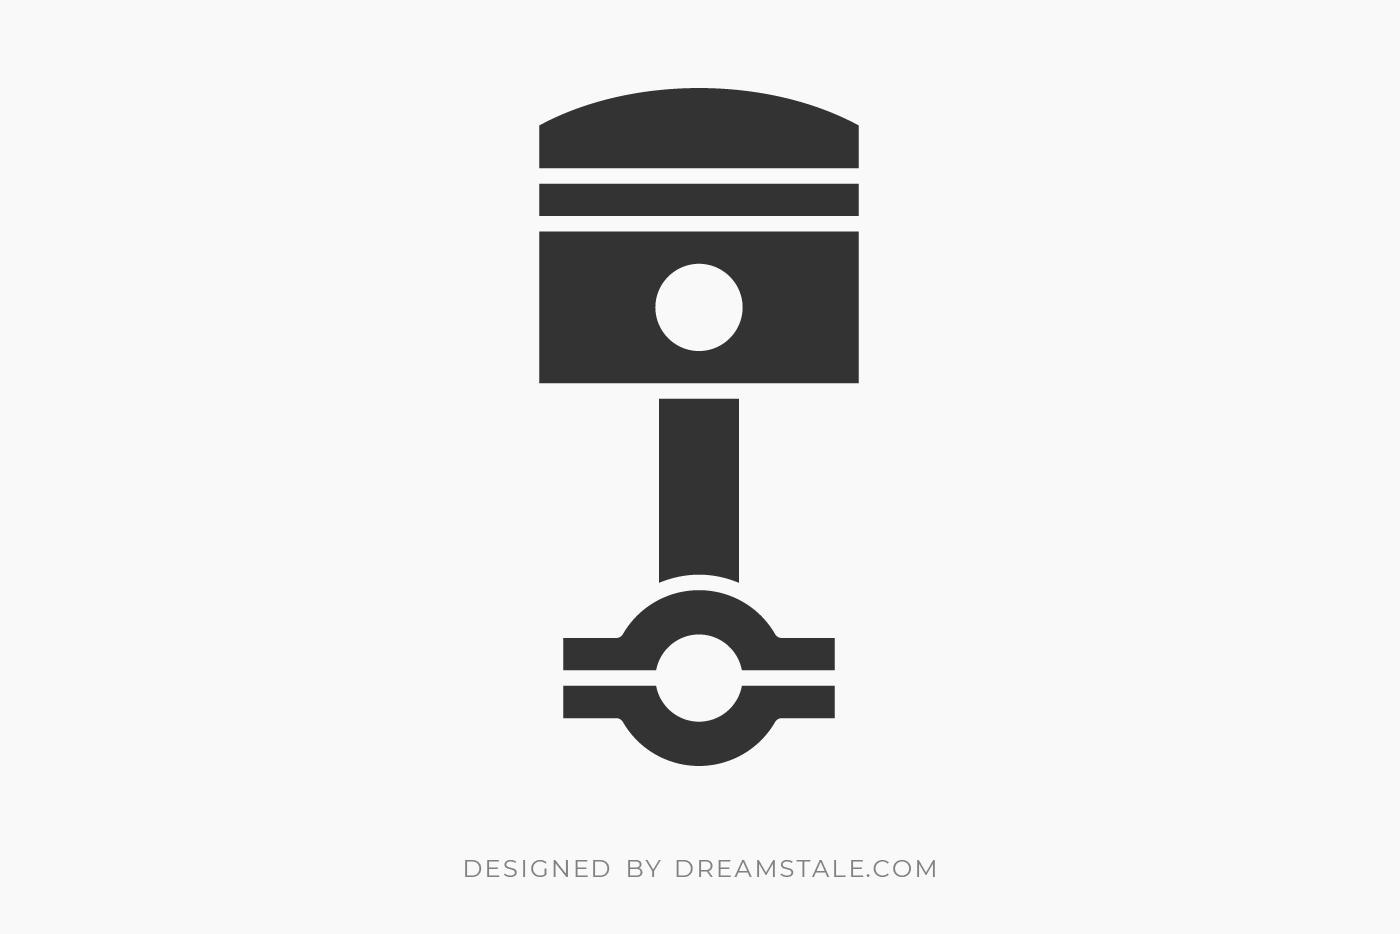 Engine Piston Free SVG